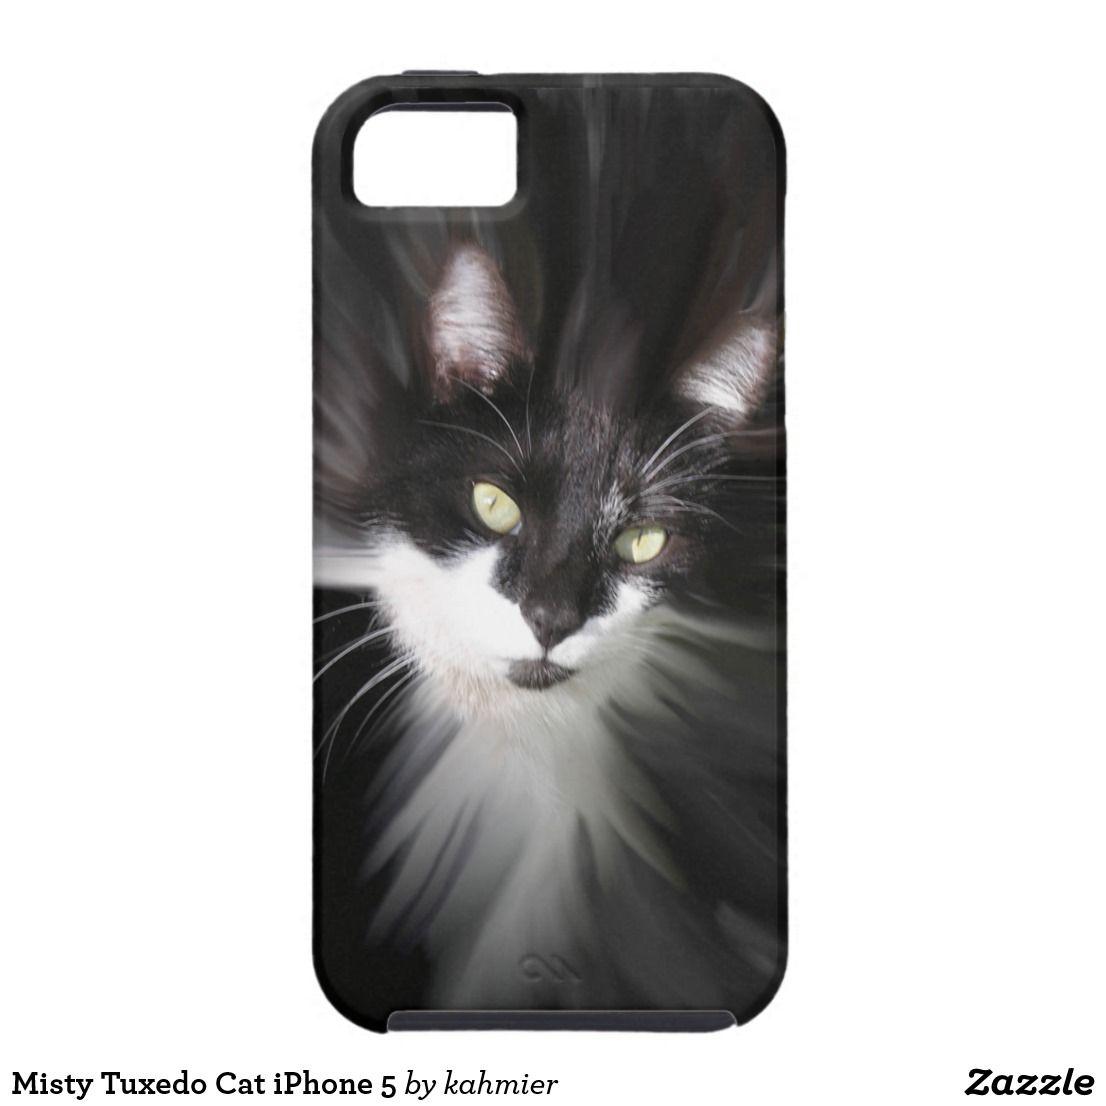 Create Your Own Iphone Ipad Case Zazzle Com Cats Iphone Cats Iphone Cases Tuxedo Cat